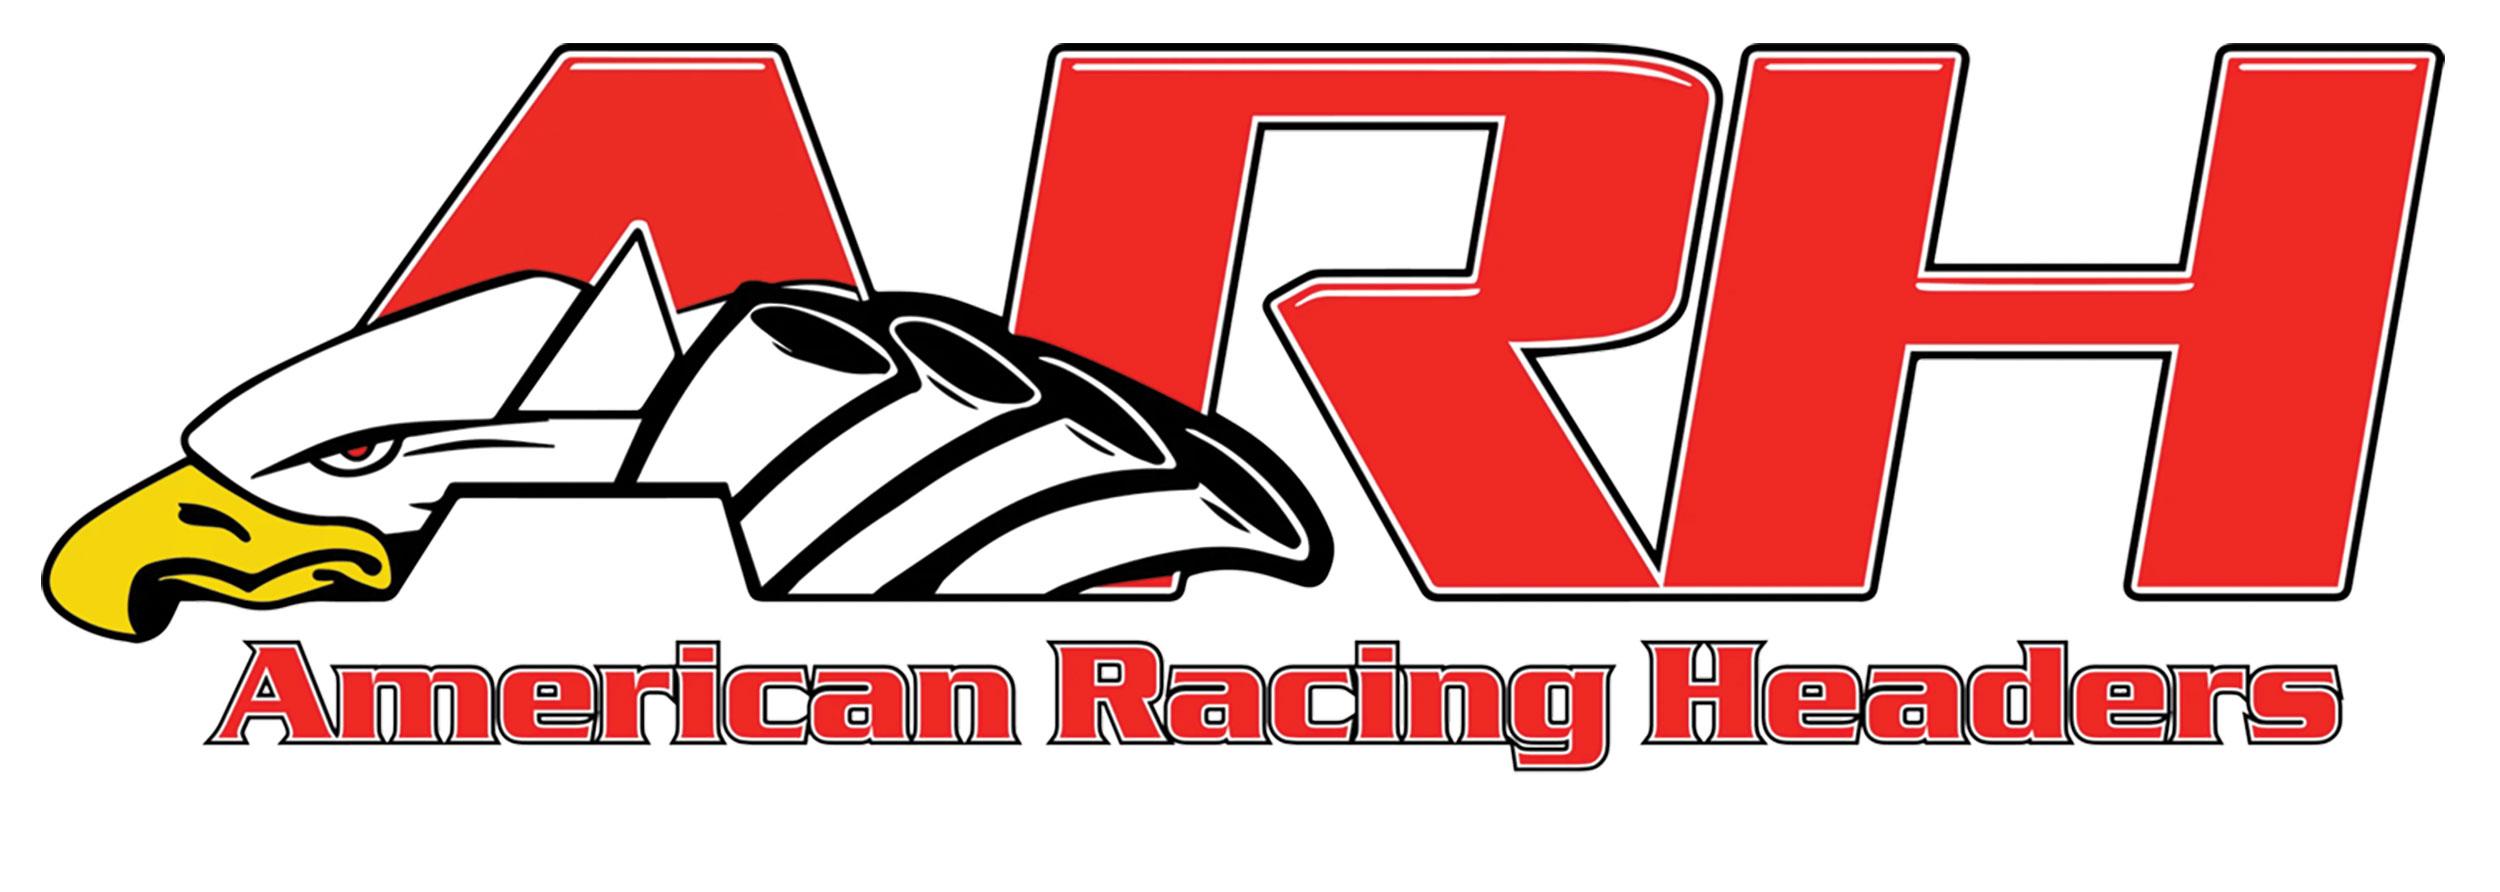 American Racing Headers logo